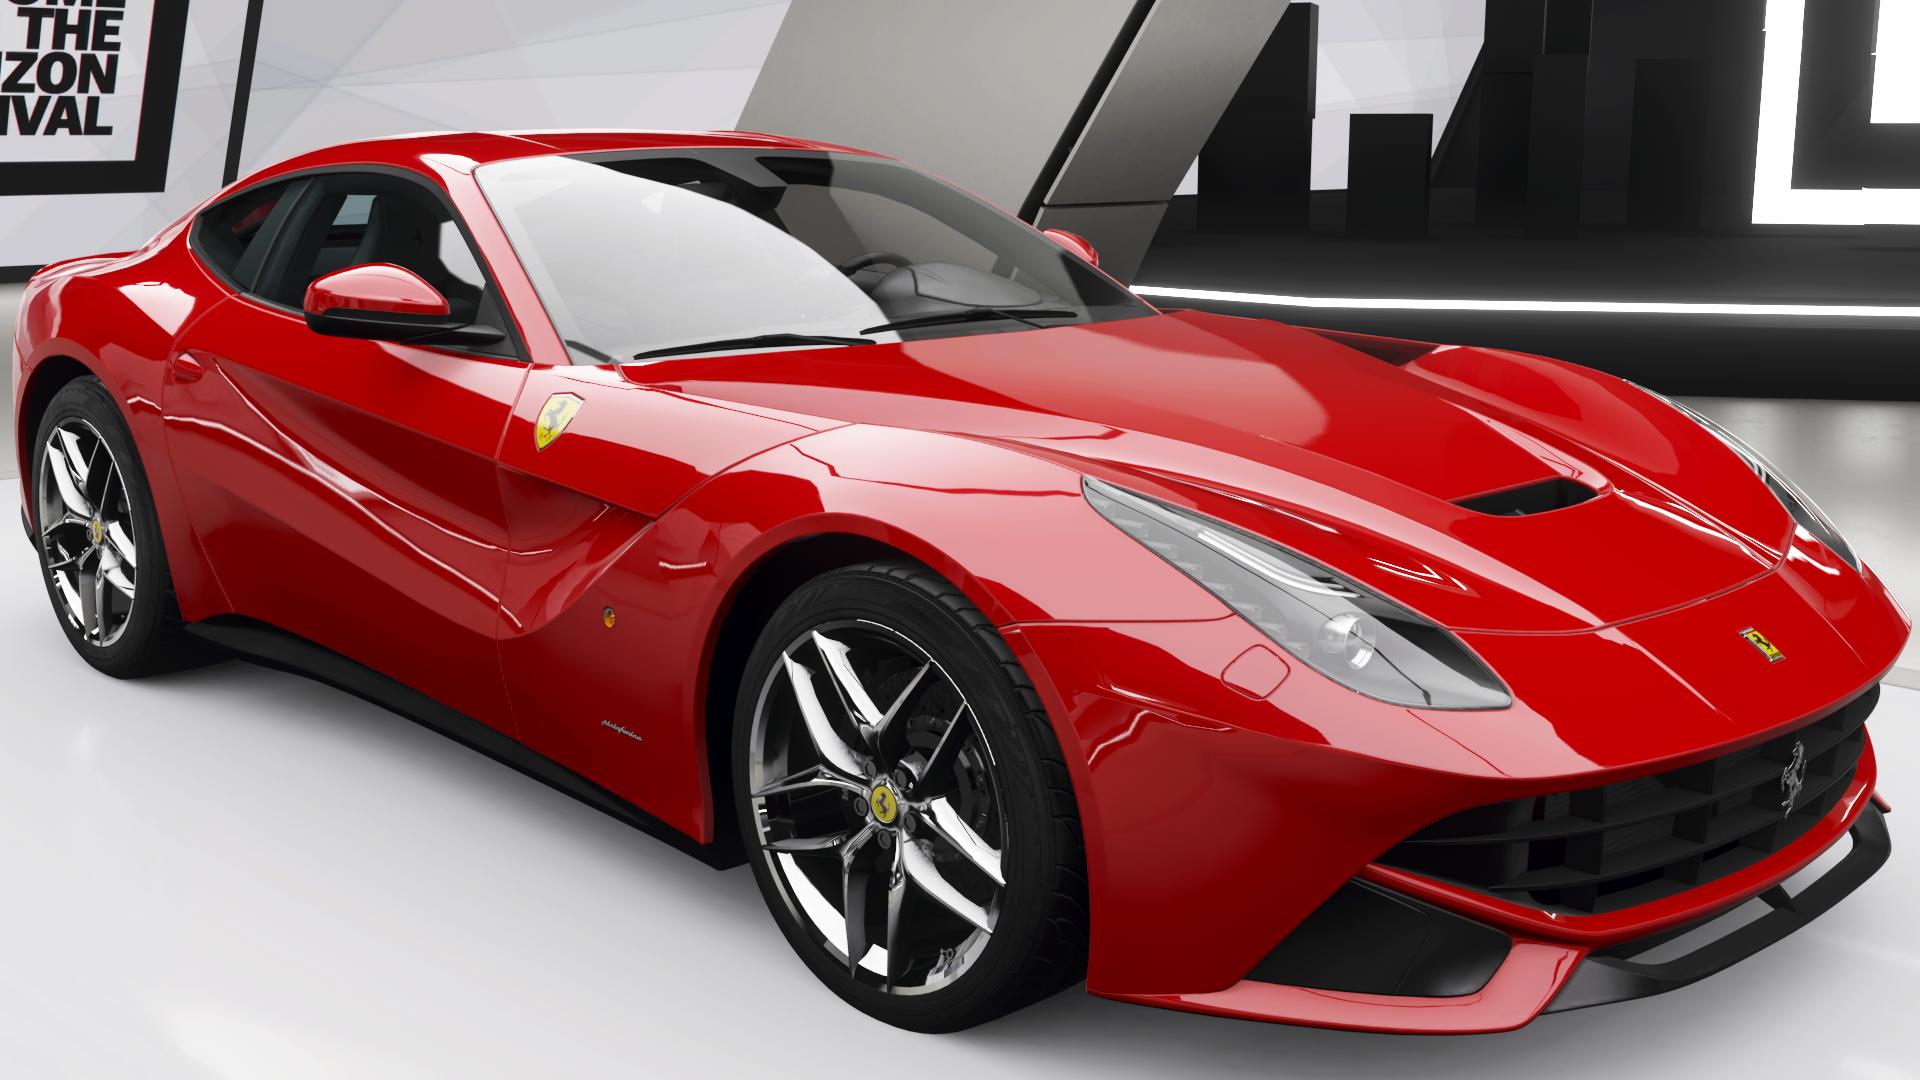 Fh4 2012 Ferrari F12berlinetta By Fred 104 Centurion On Deviantart